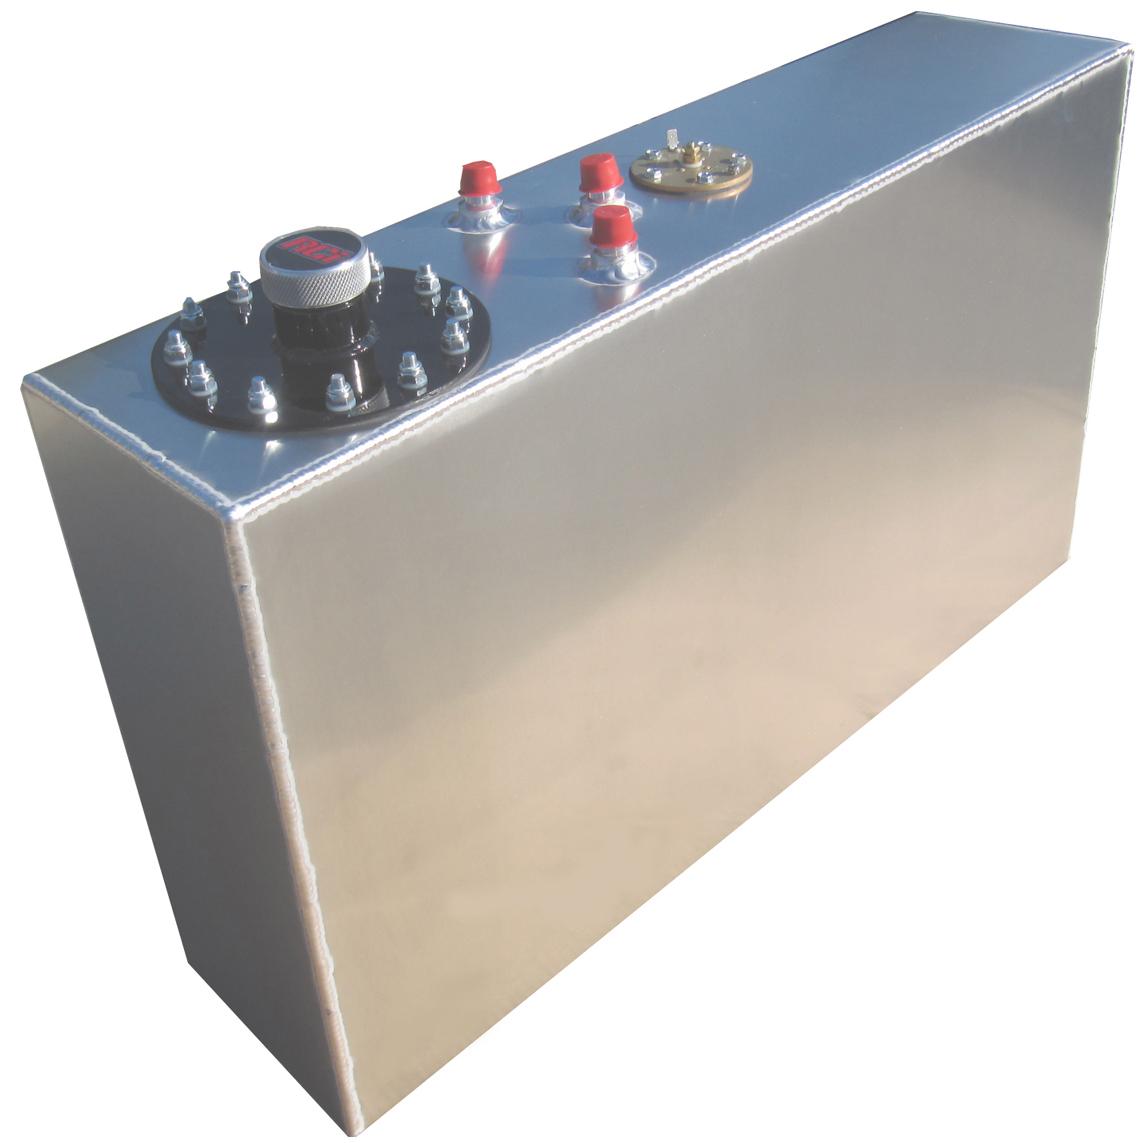 New Rci 17 Gallon Street Rod Aluminum Fuel Cell 17 Quot W